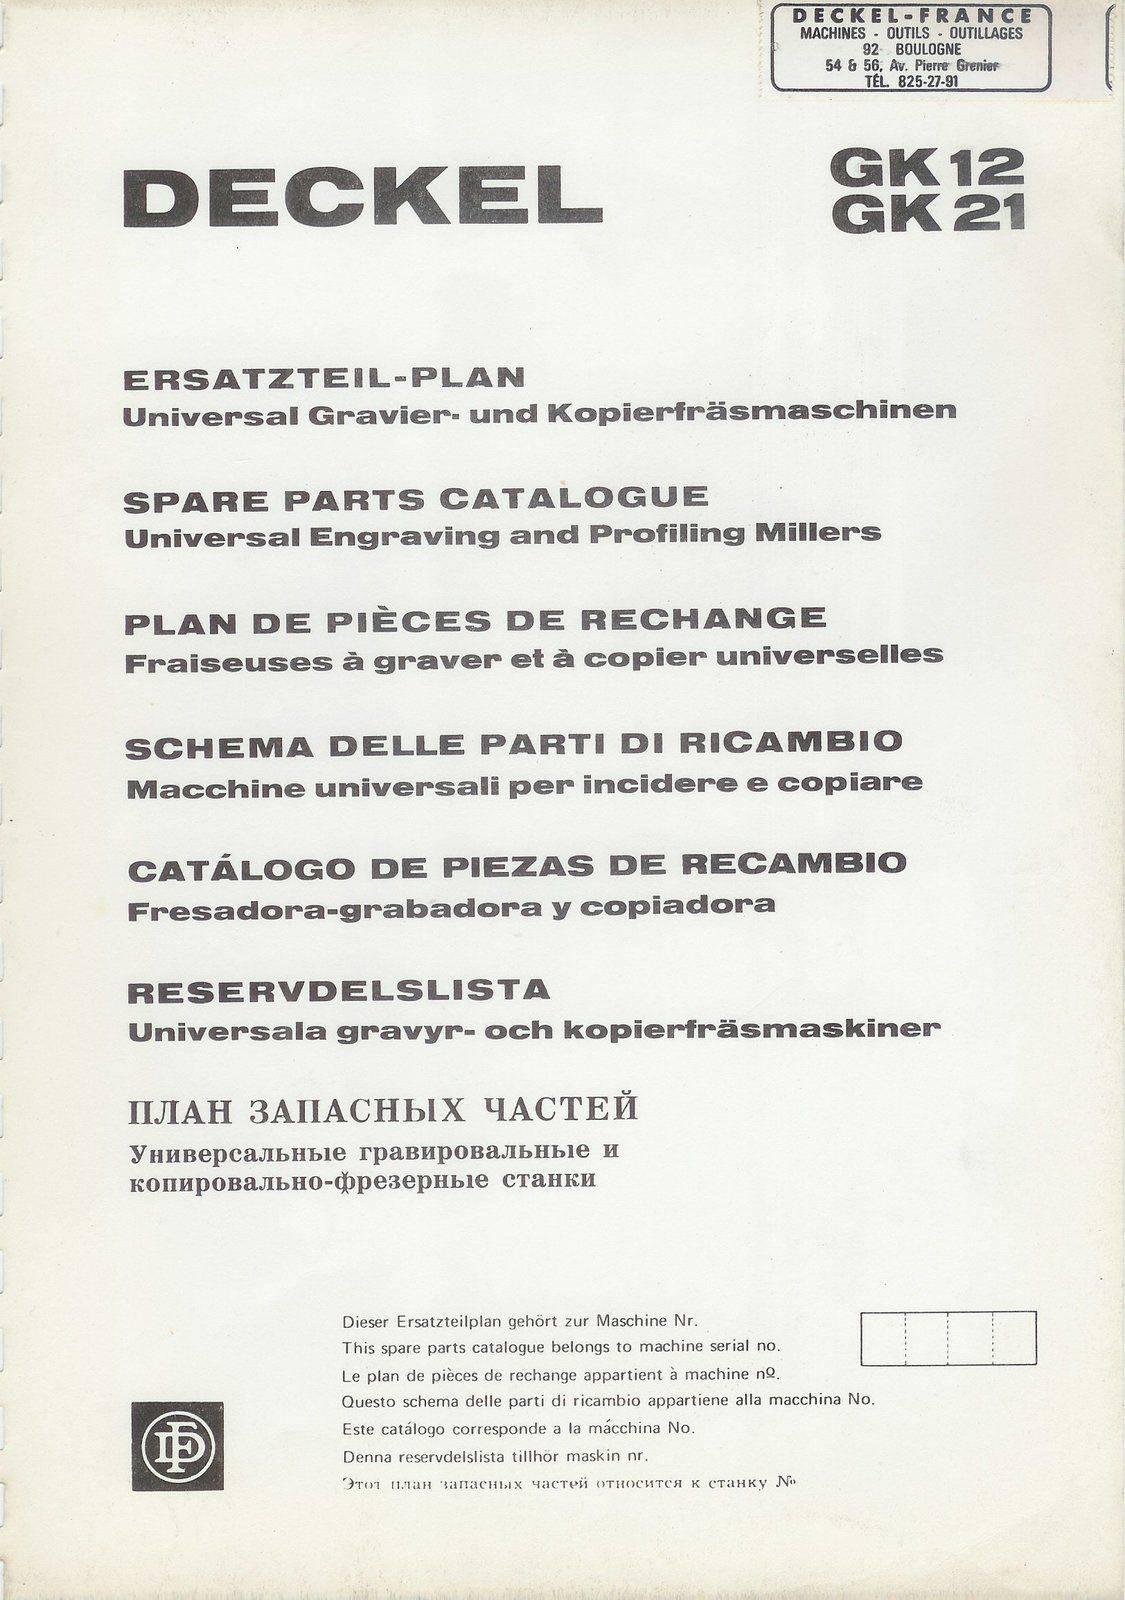 Deckel GK12-21 Parts Catalogue 1975.jpg